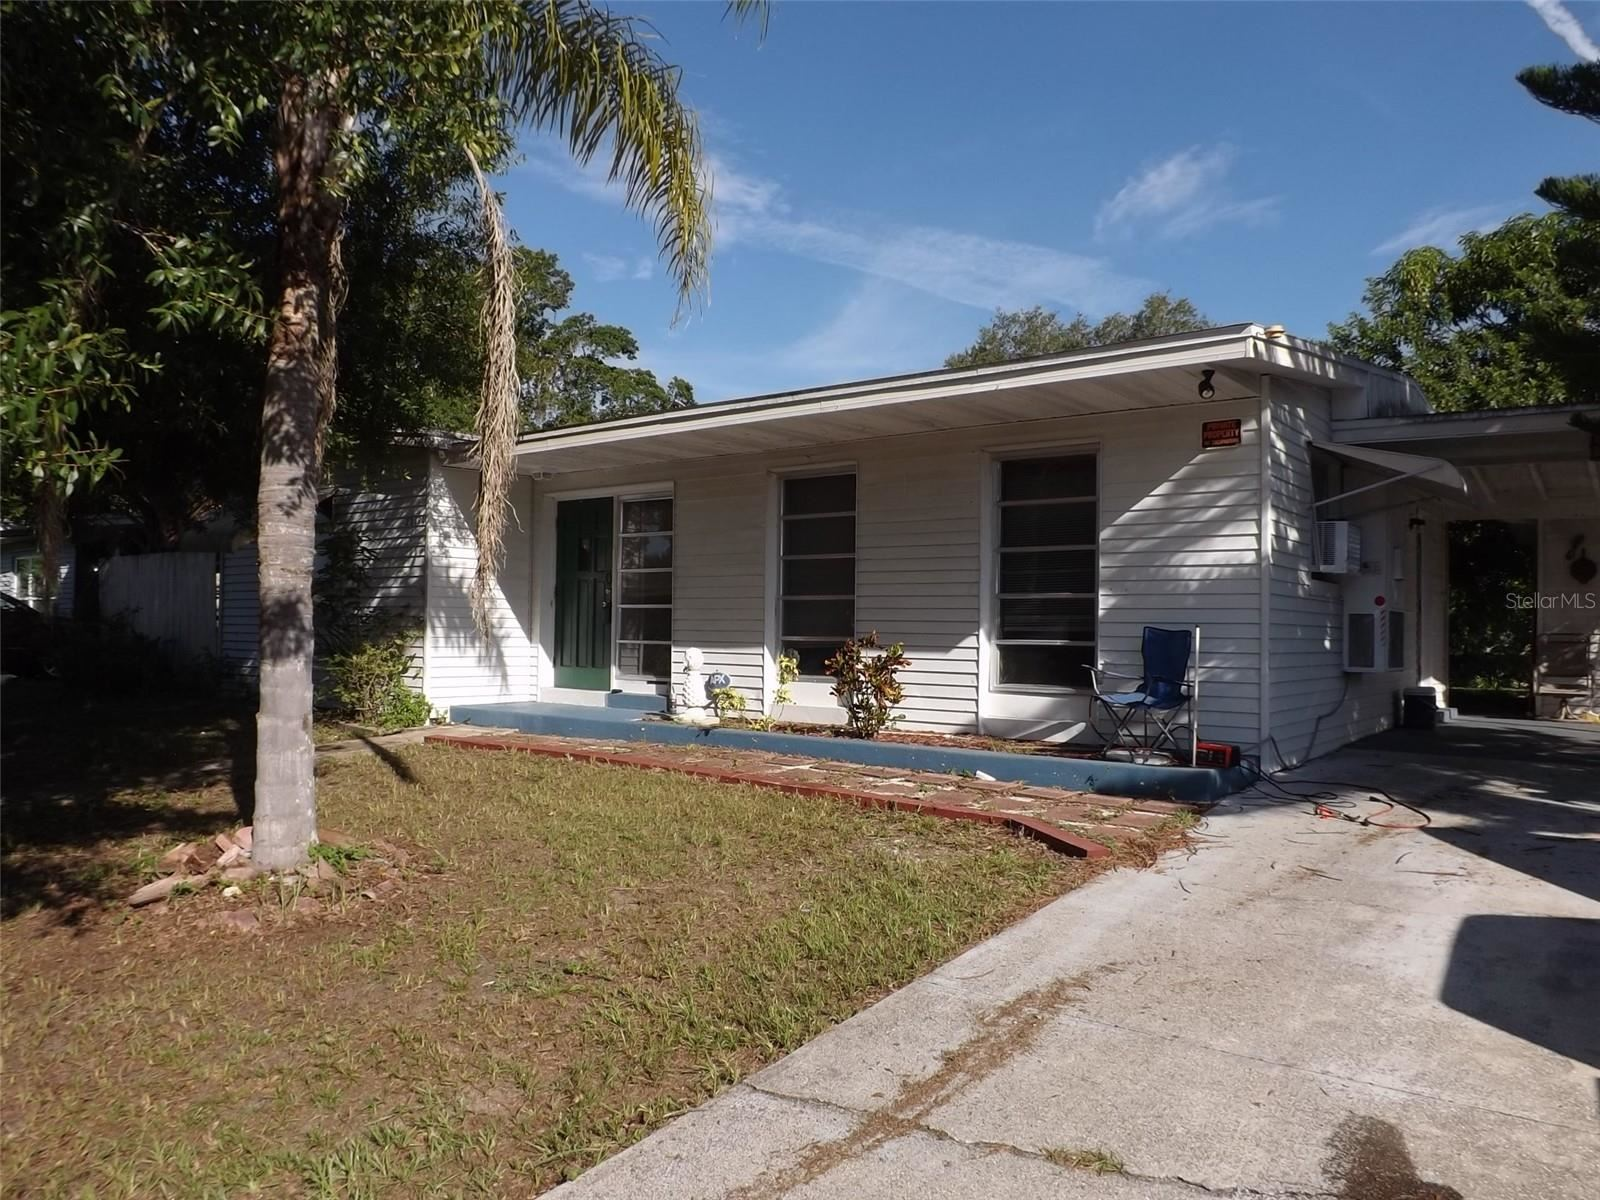 Photo of 22194 HERNANDO AVENUE, PORT CHARLOTTE, FL 33952 (MLS # C7446329)